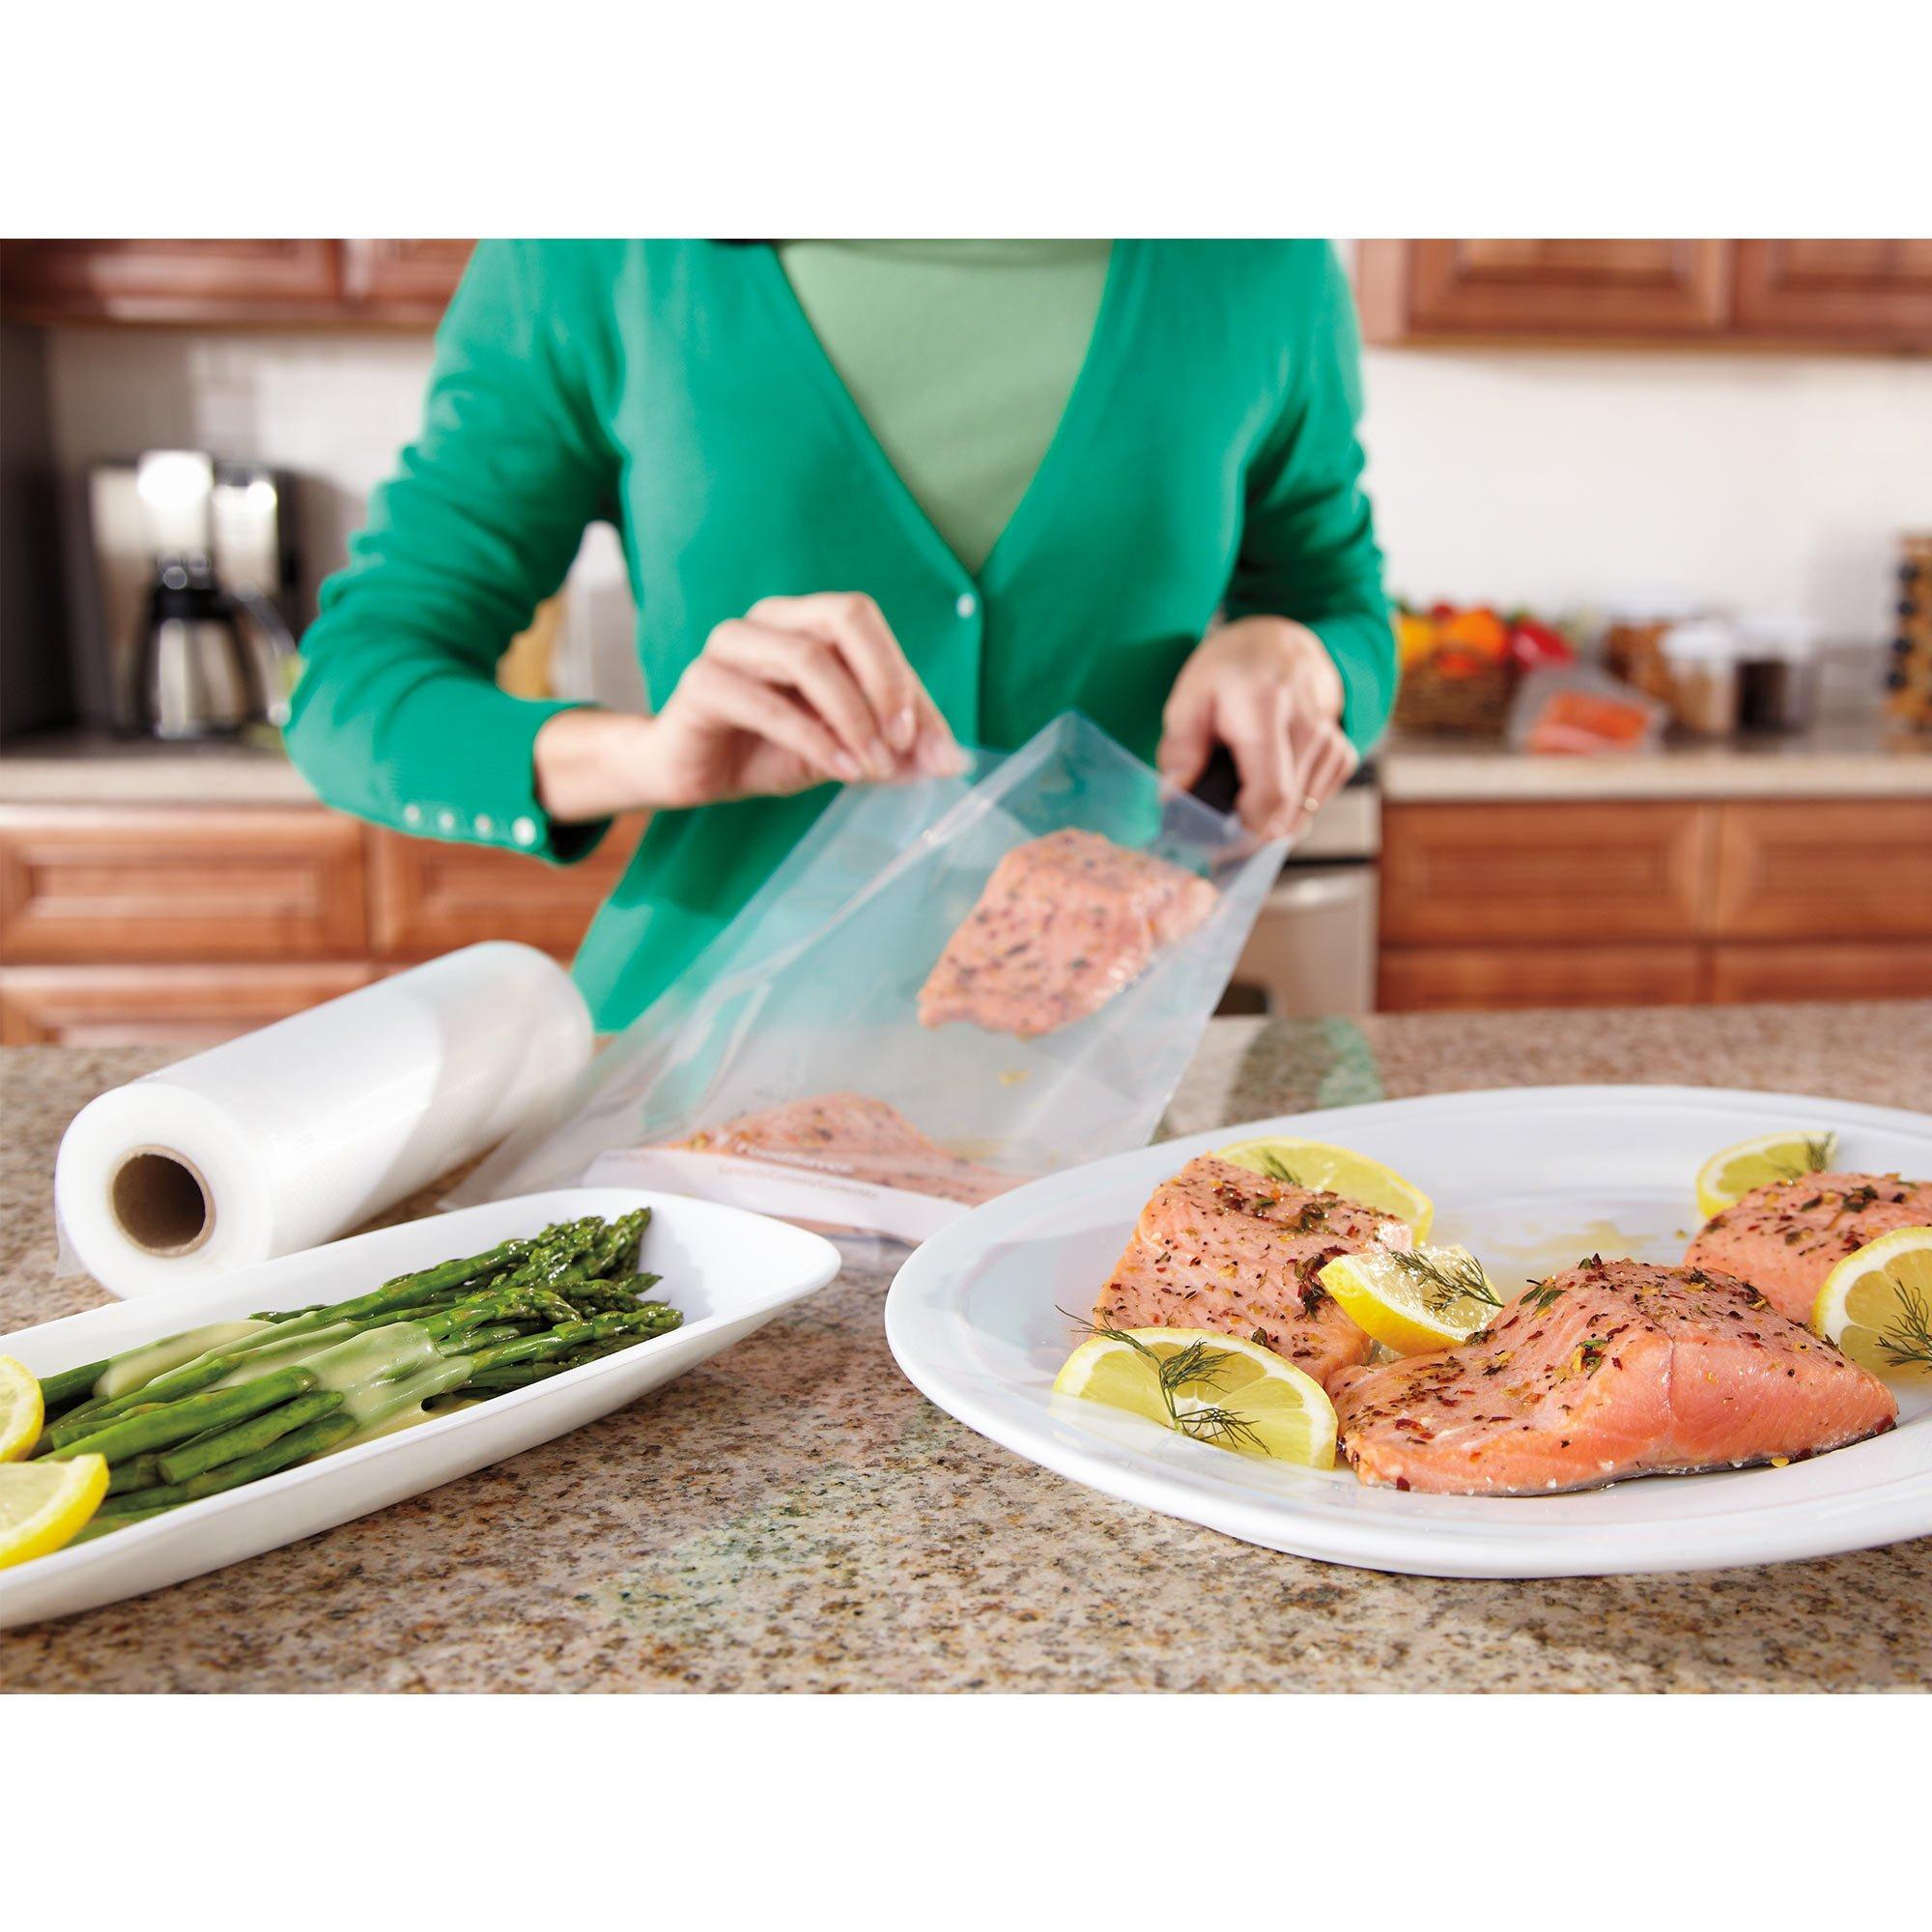 FoodSaver Heat-Seal Rolls, 5-Pack by FoodSaver (Image #3)